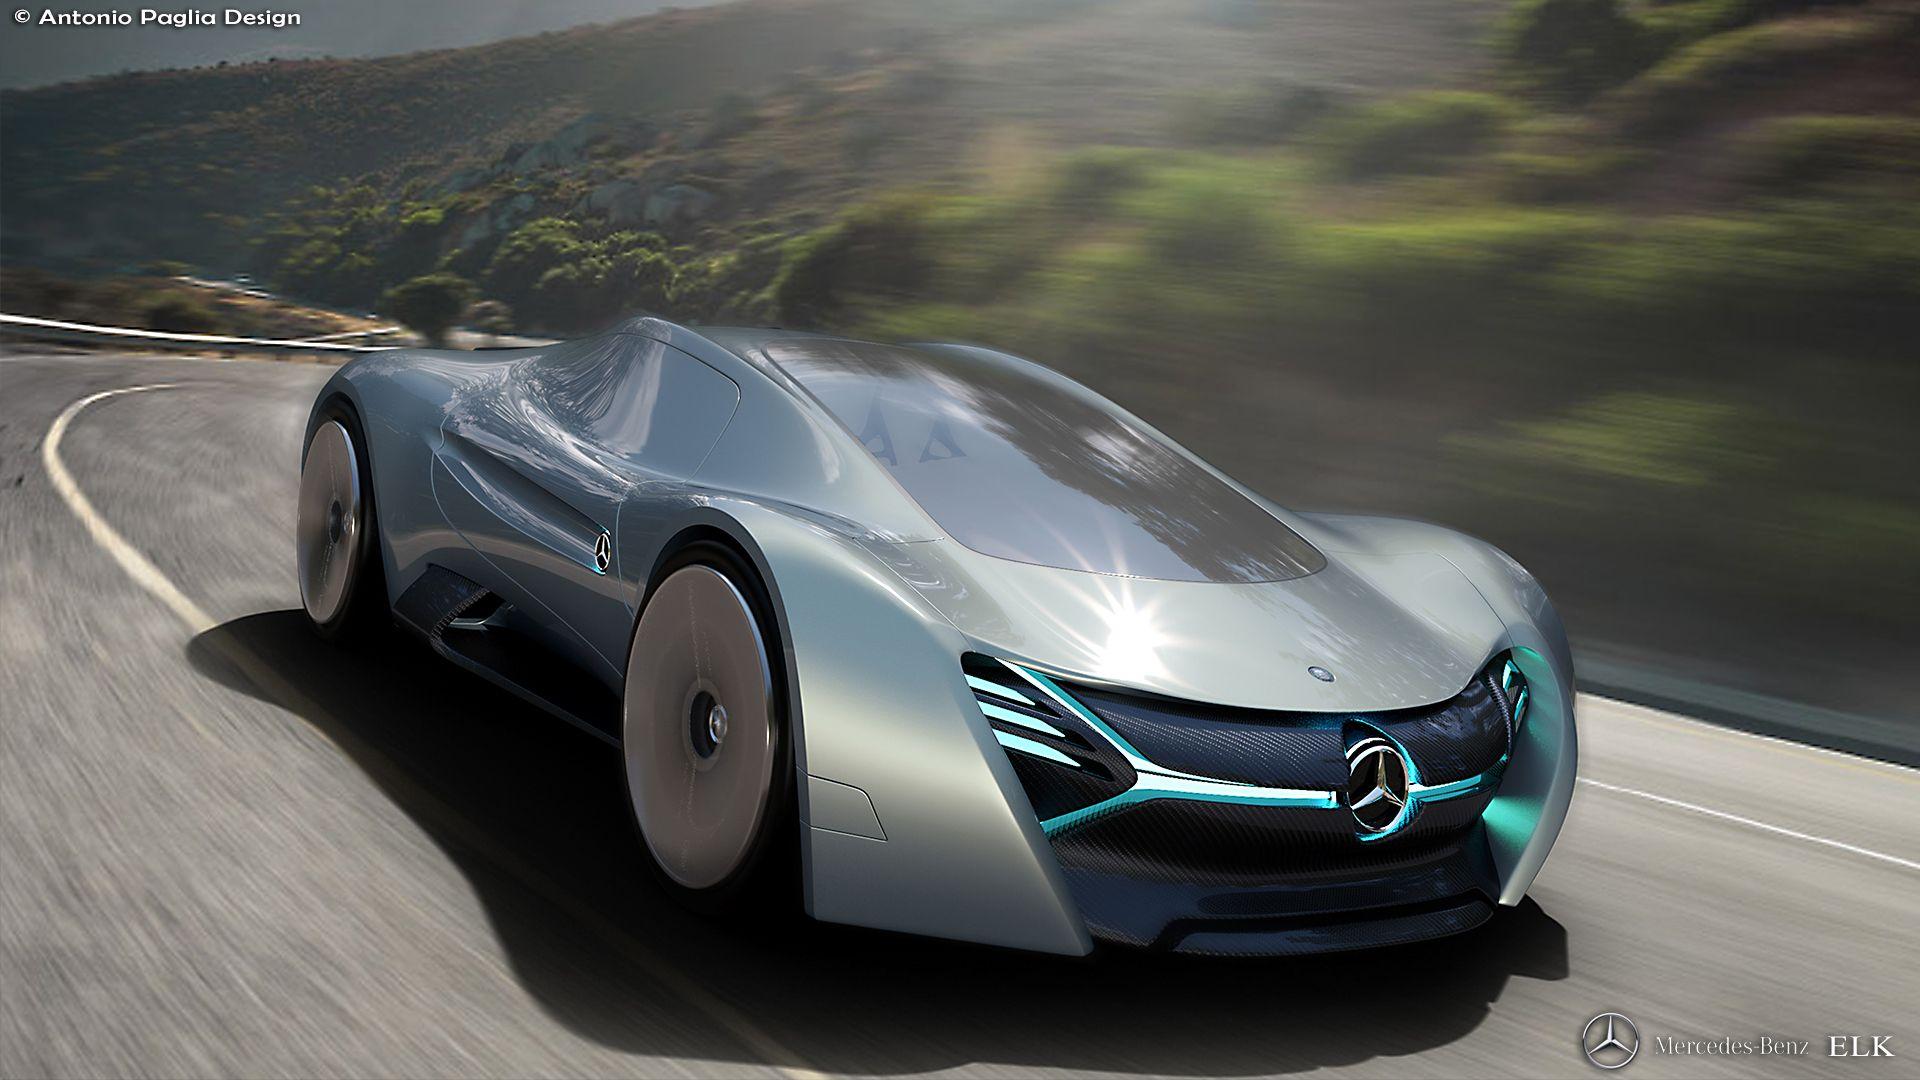 A Medium Size Sport Concept Car For Mercedes Benz Modelling With Automotive Alias Concept Cars Mercedes Electric Futuristic Cars